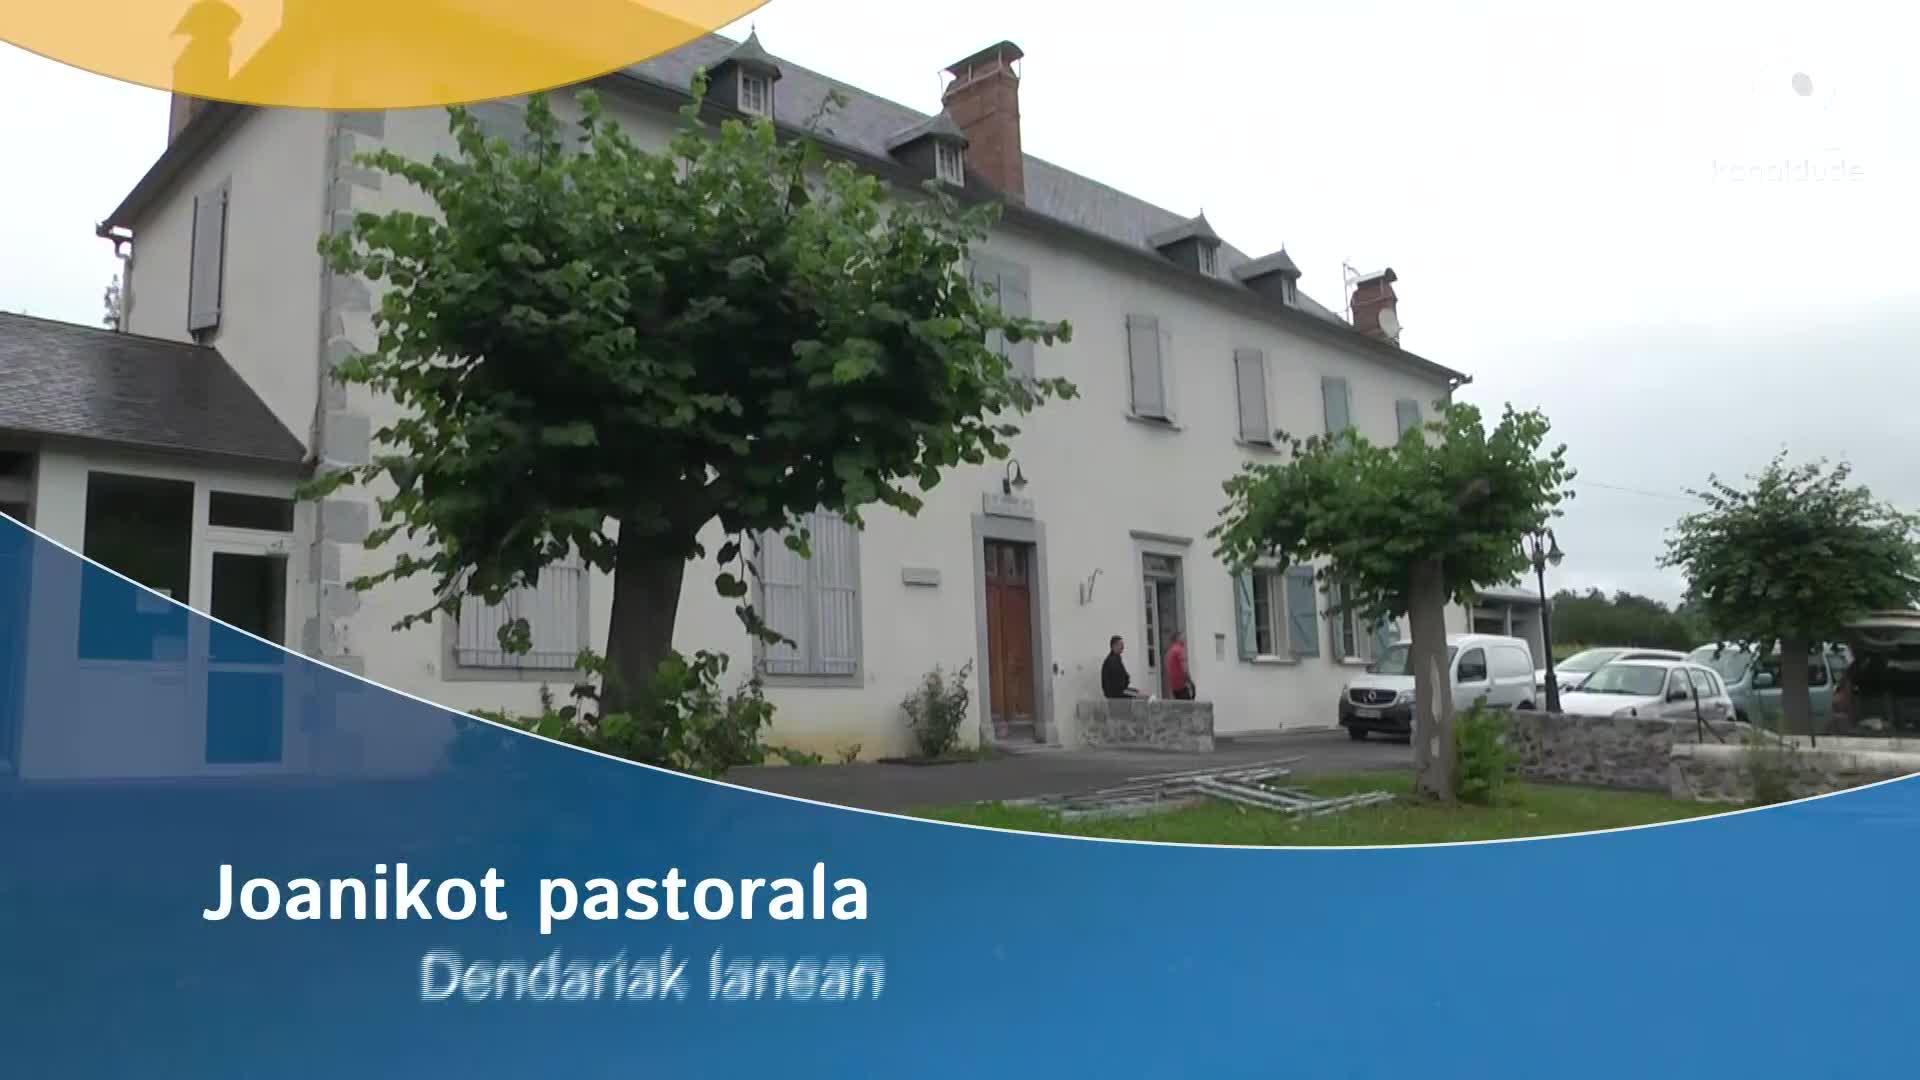 Joanikot pastorala : dendariak lanean